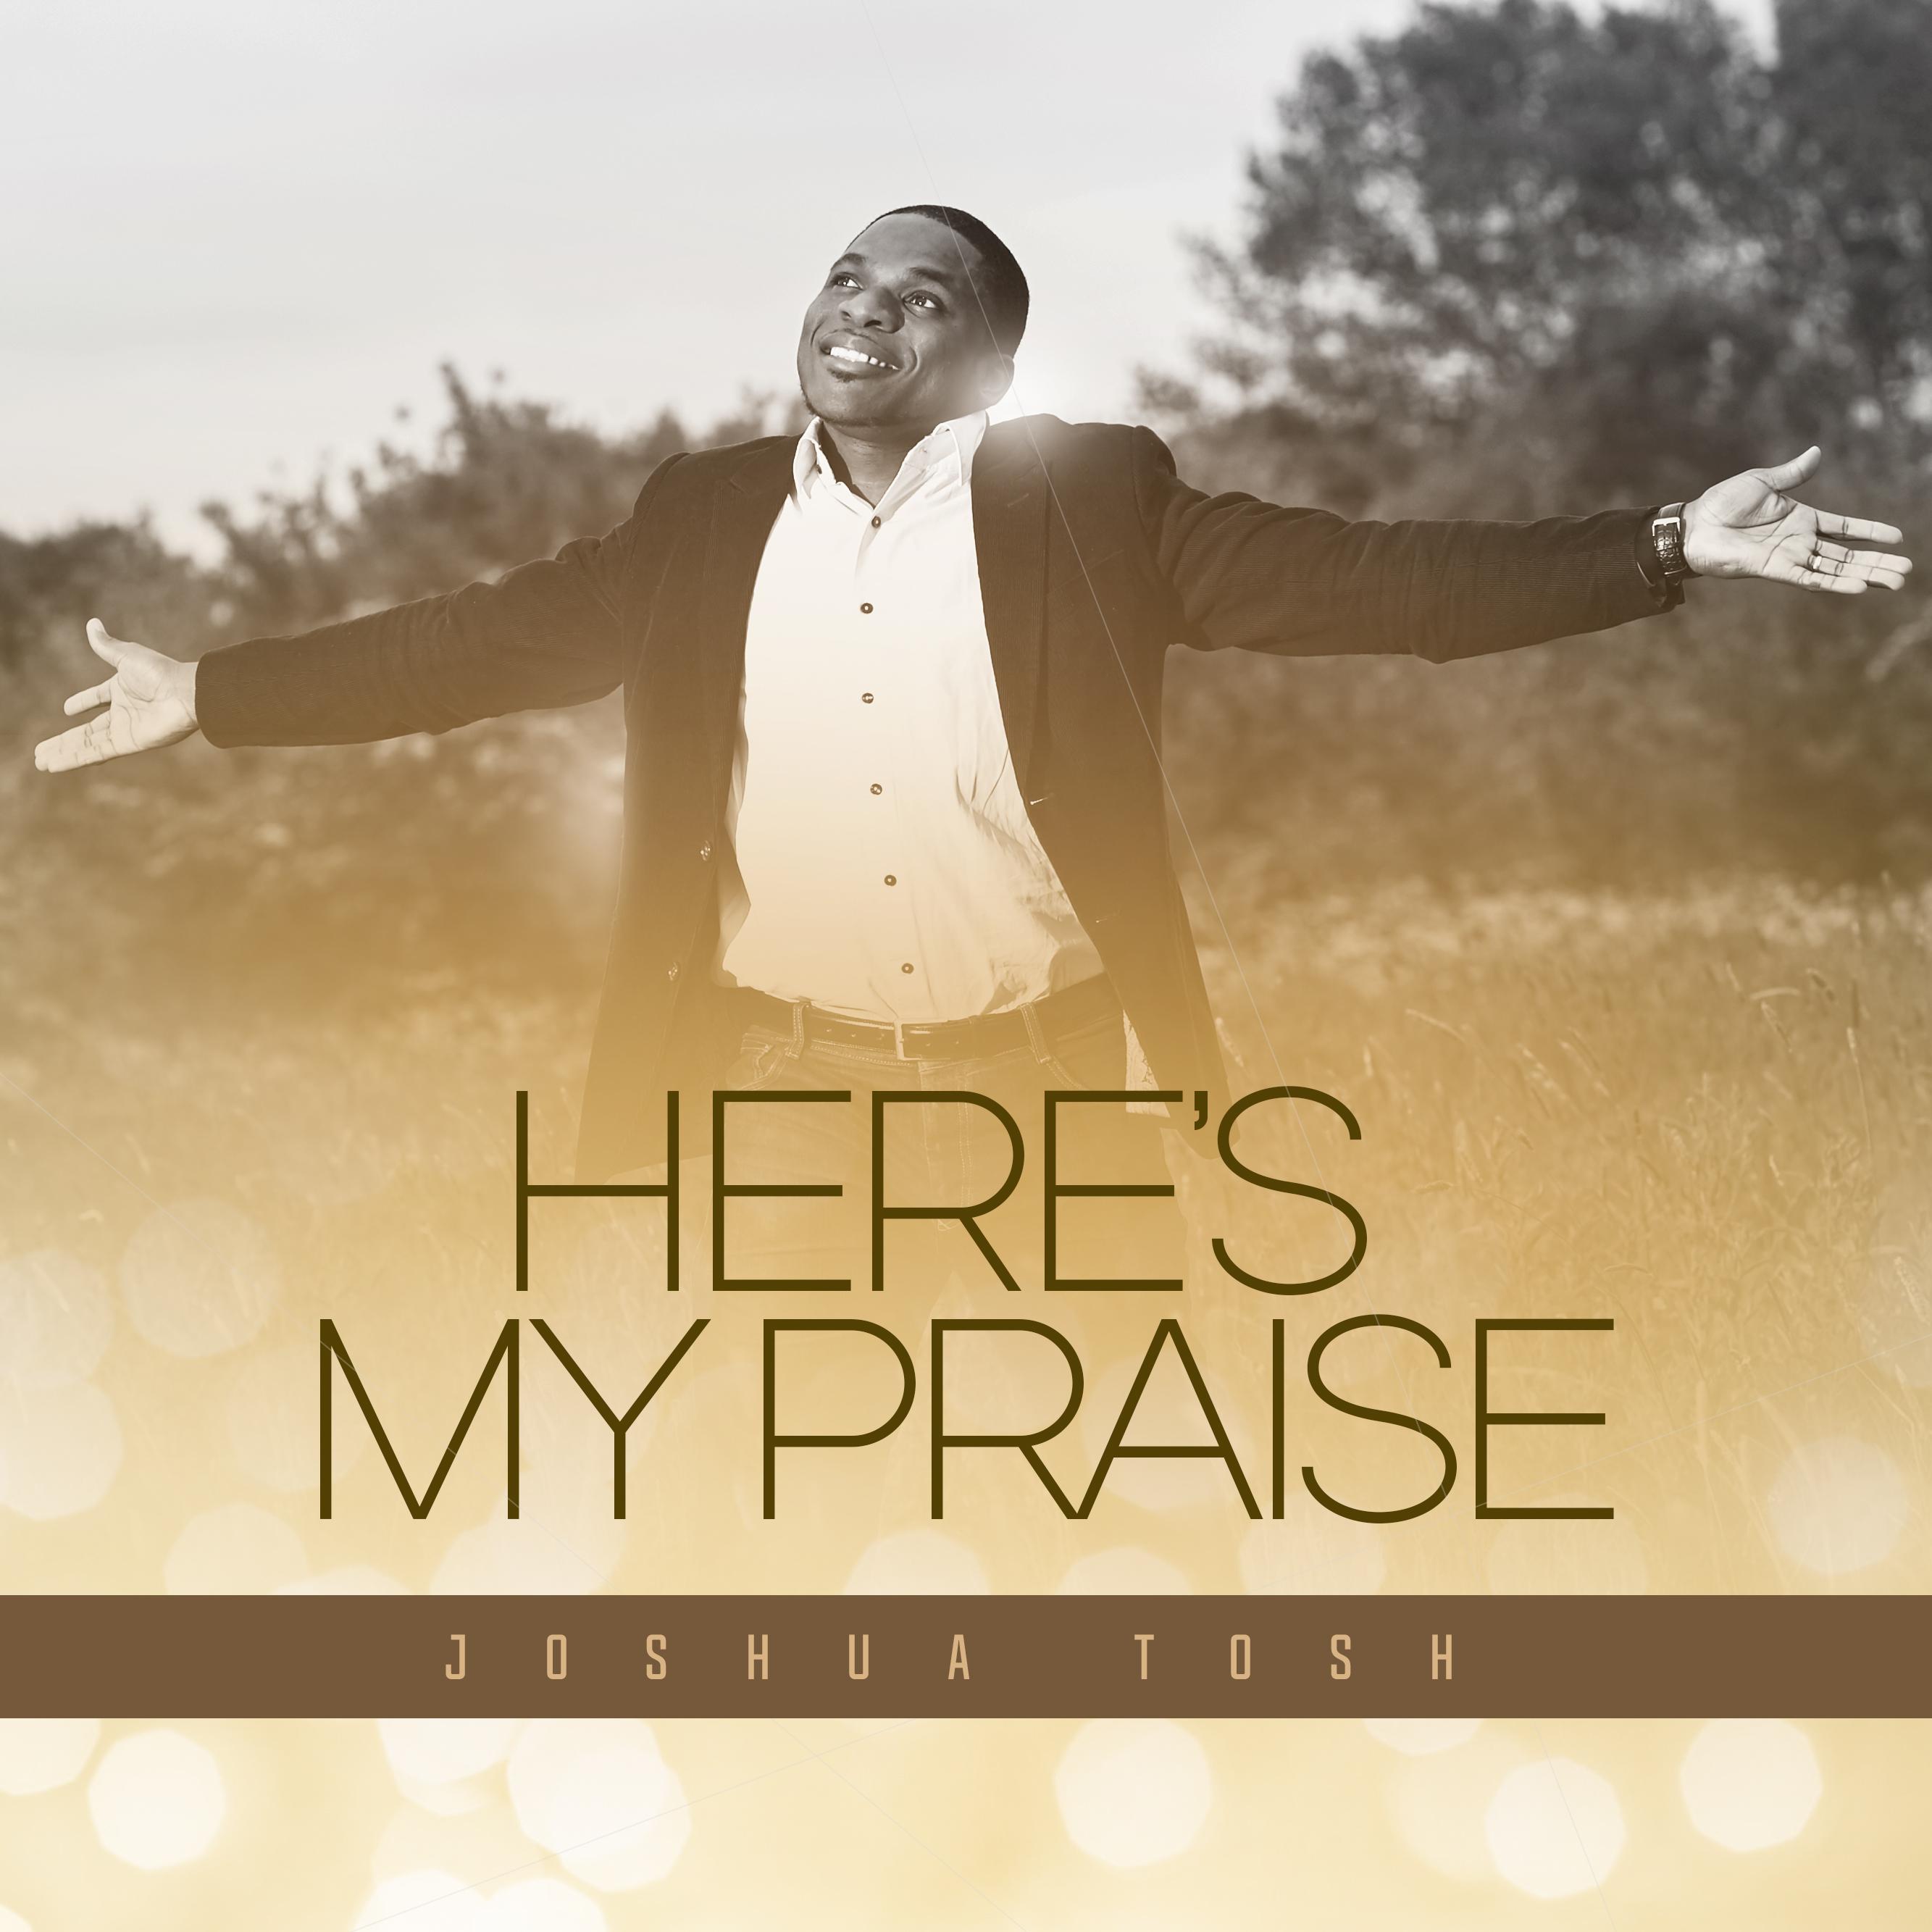 HeresMyPraise Cover